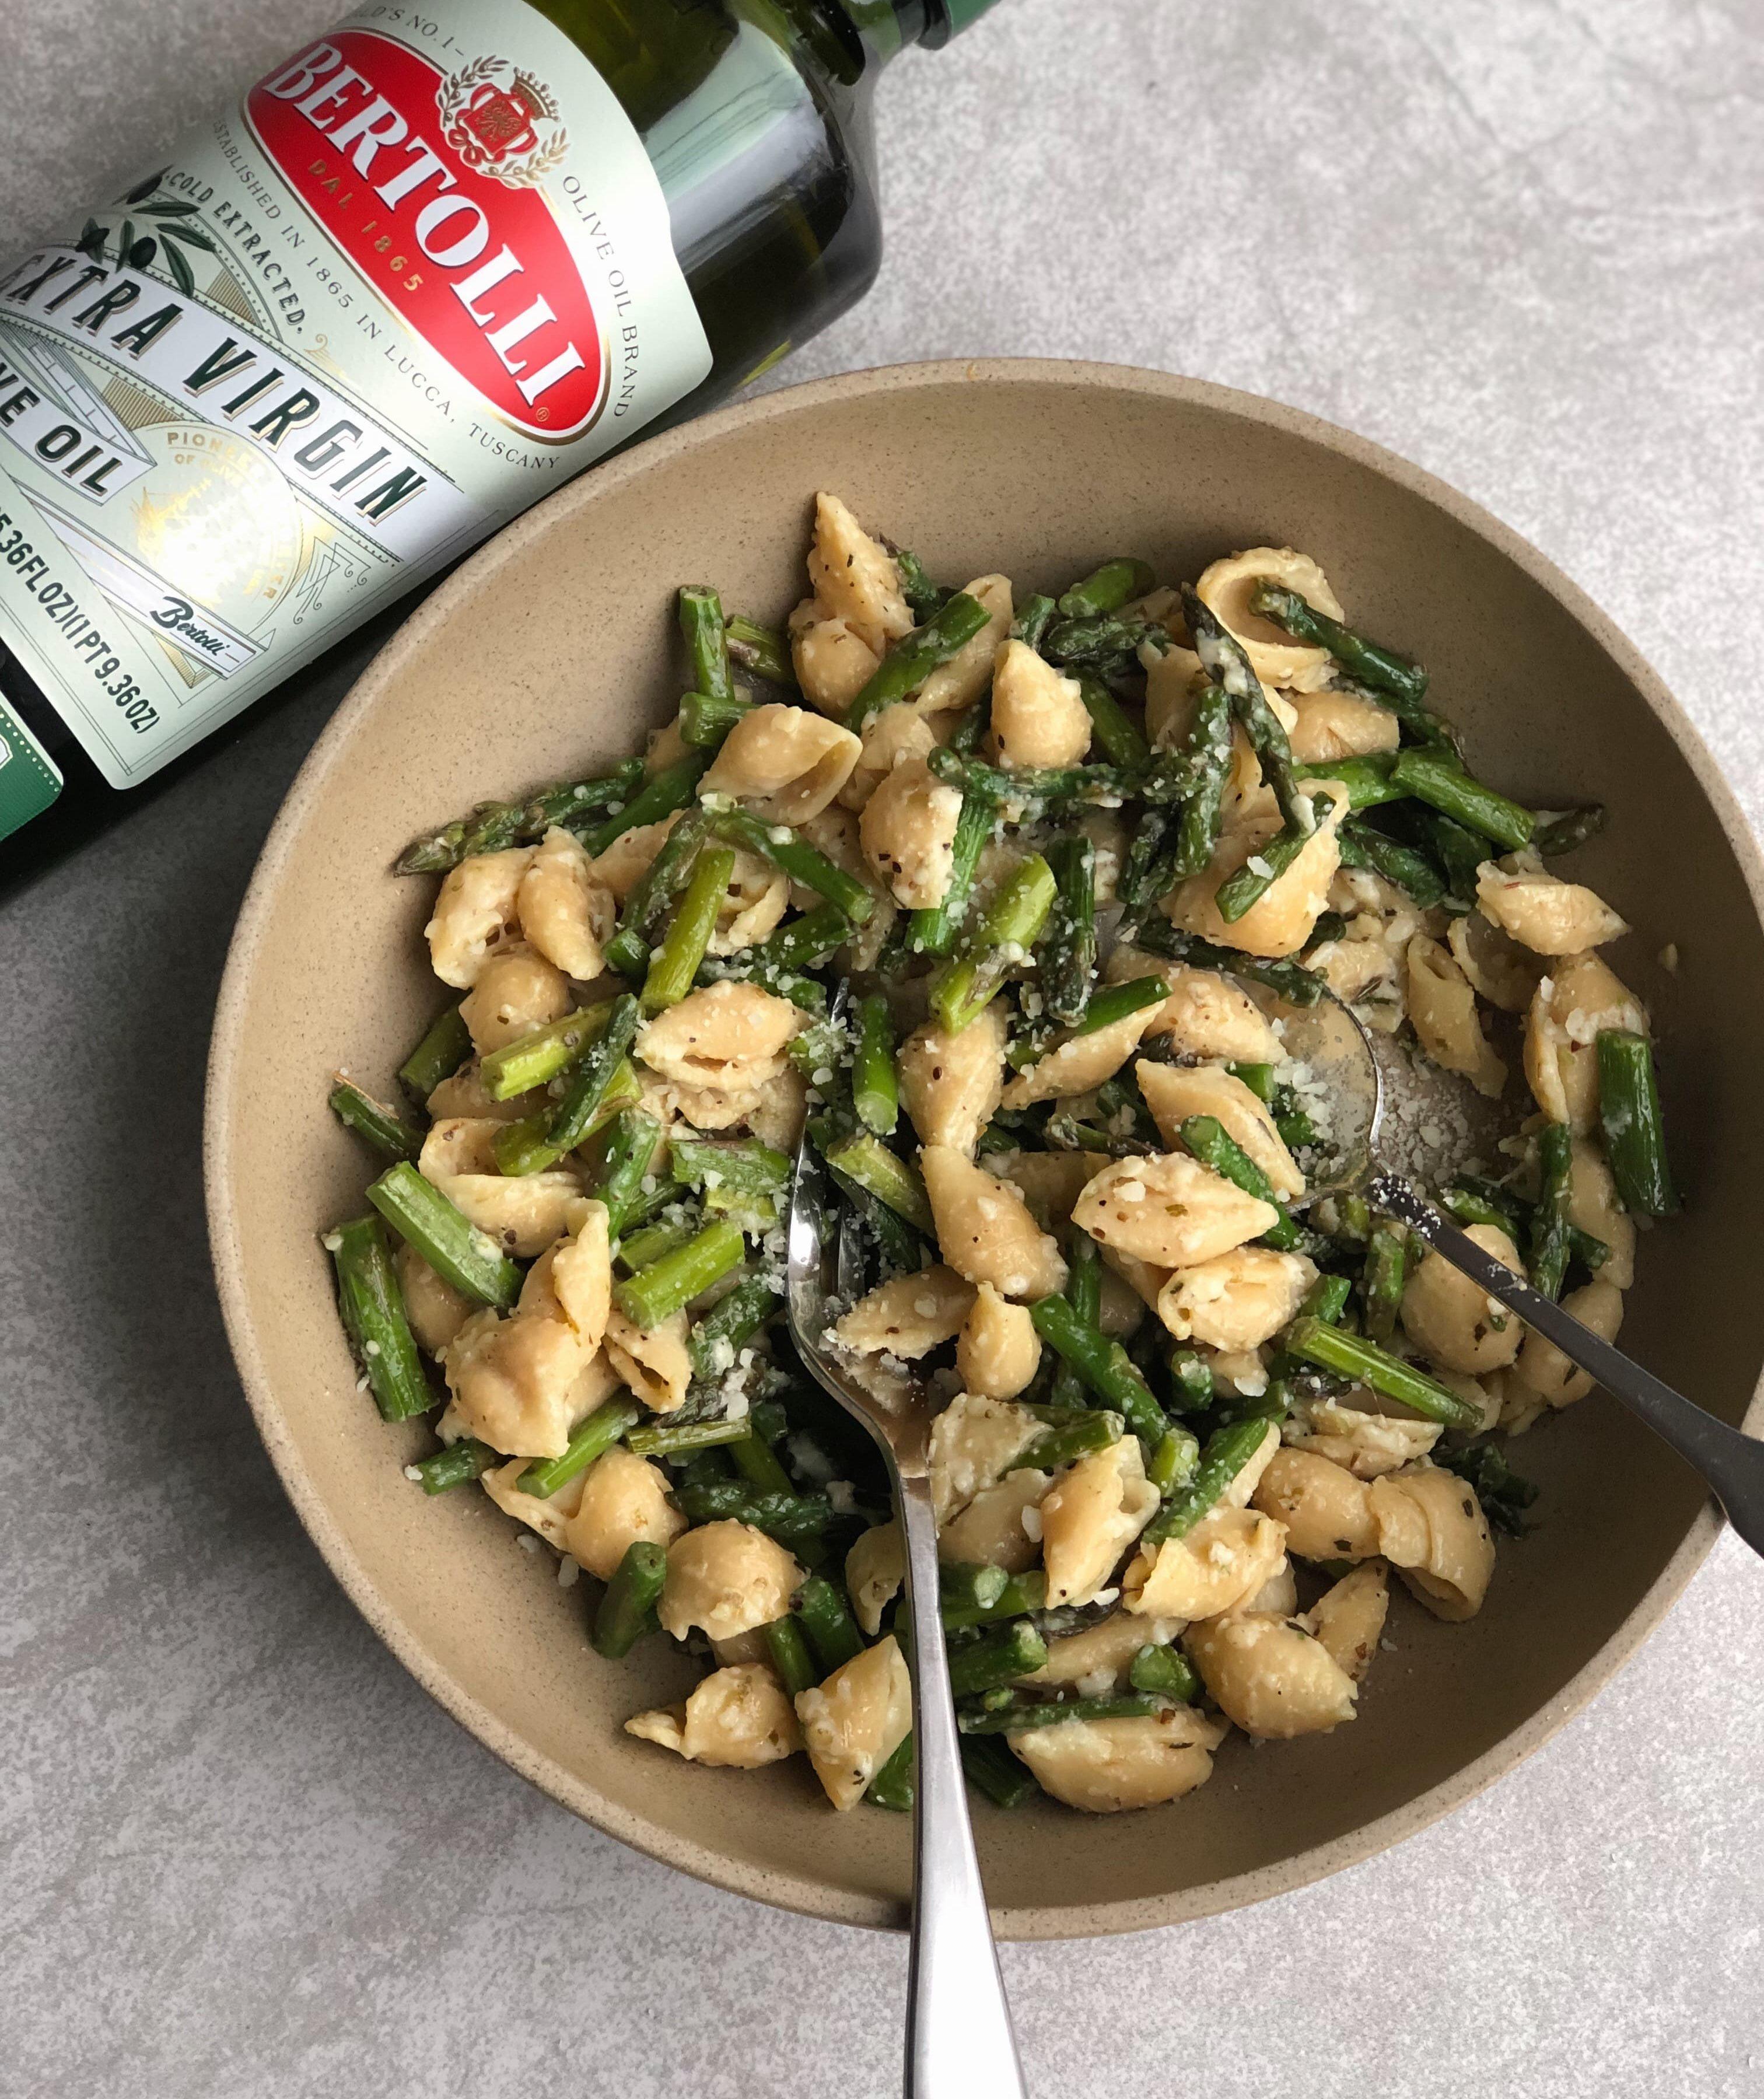 Lemon Asparagus Pasta with Bertolli Olive Oil